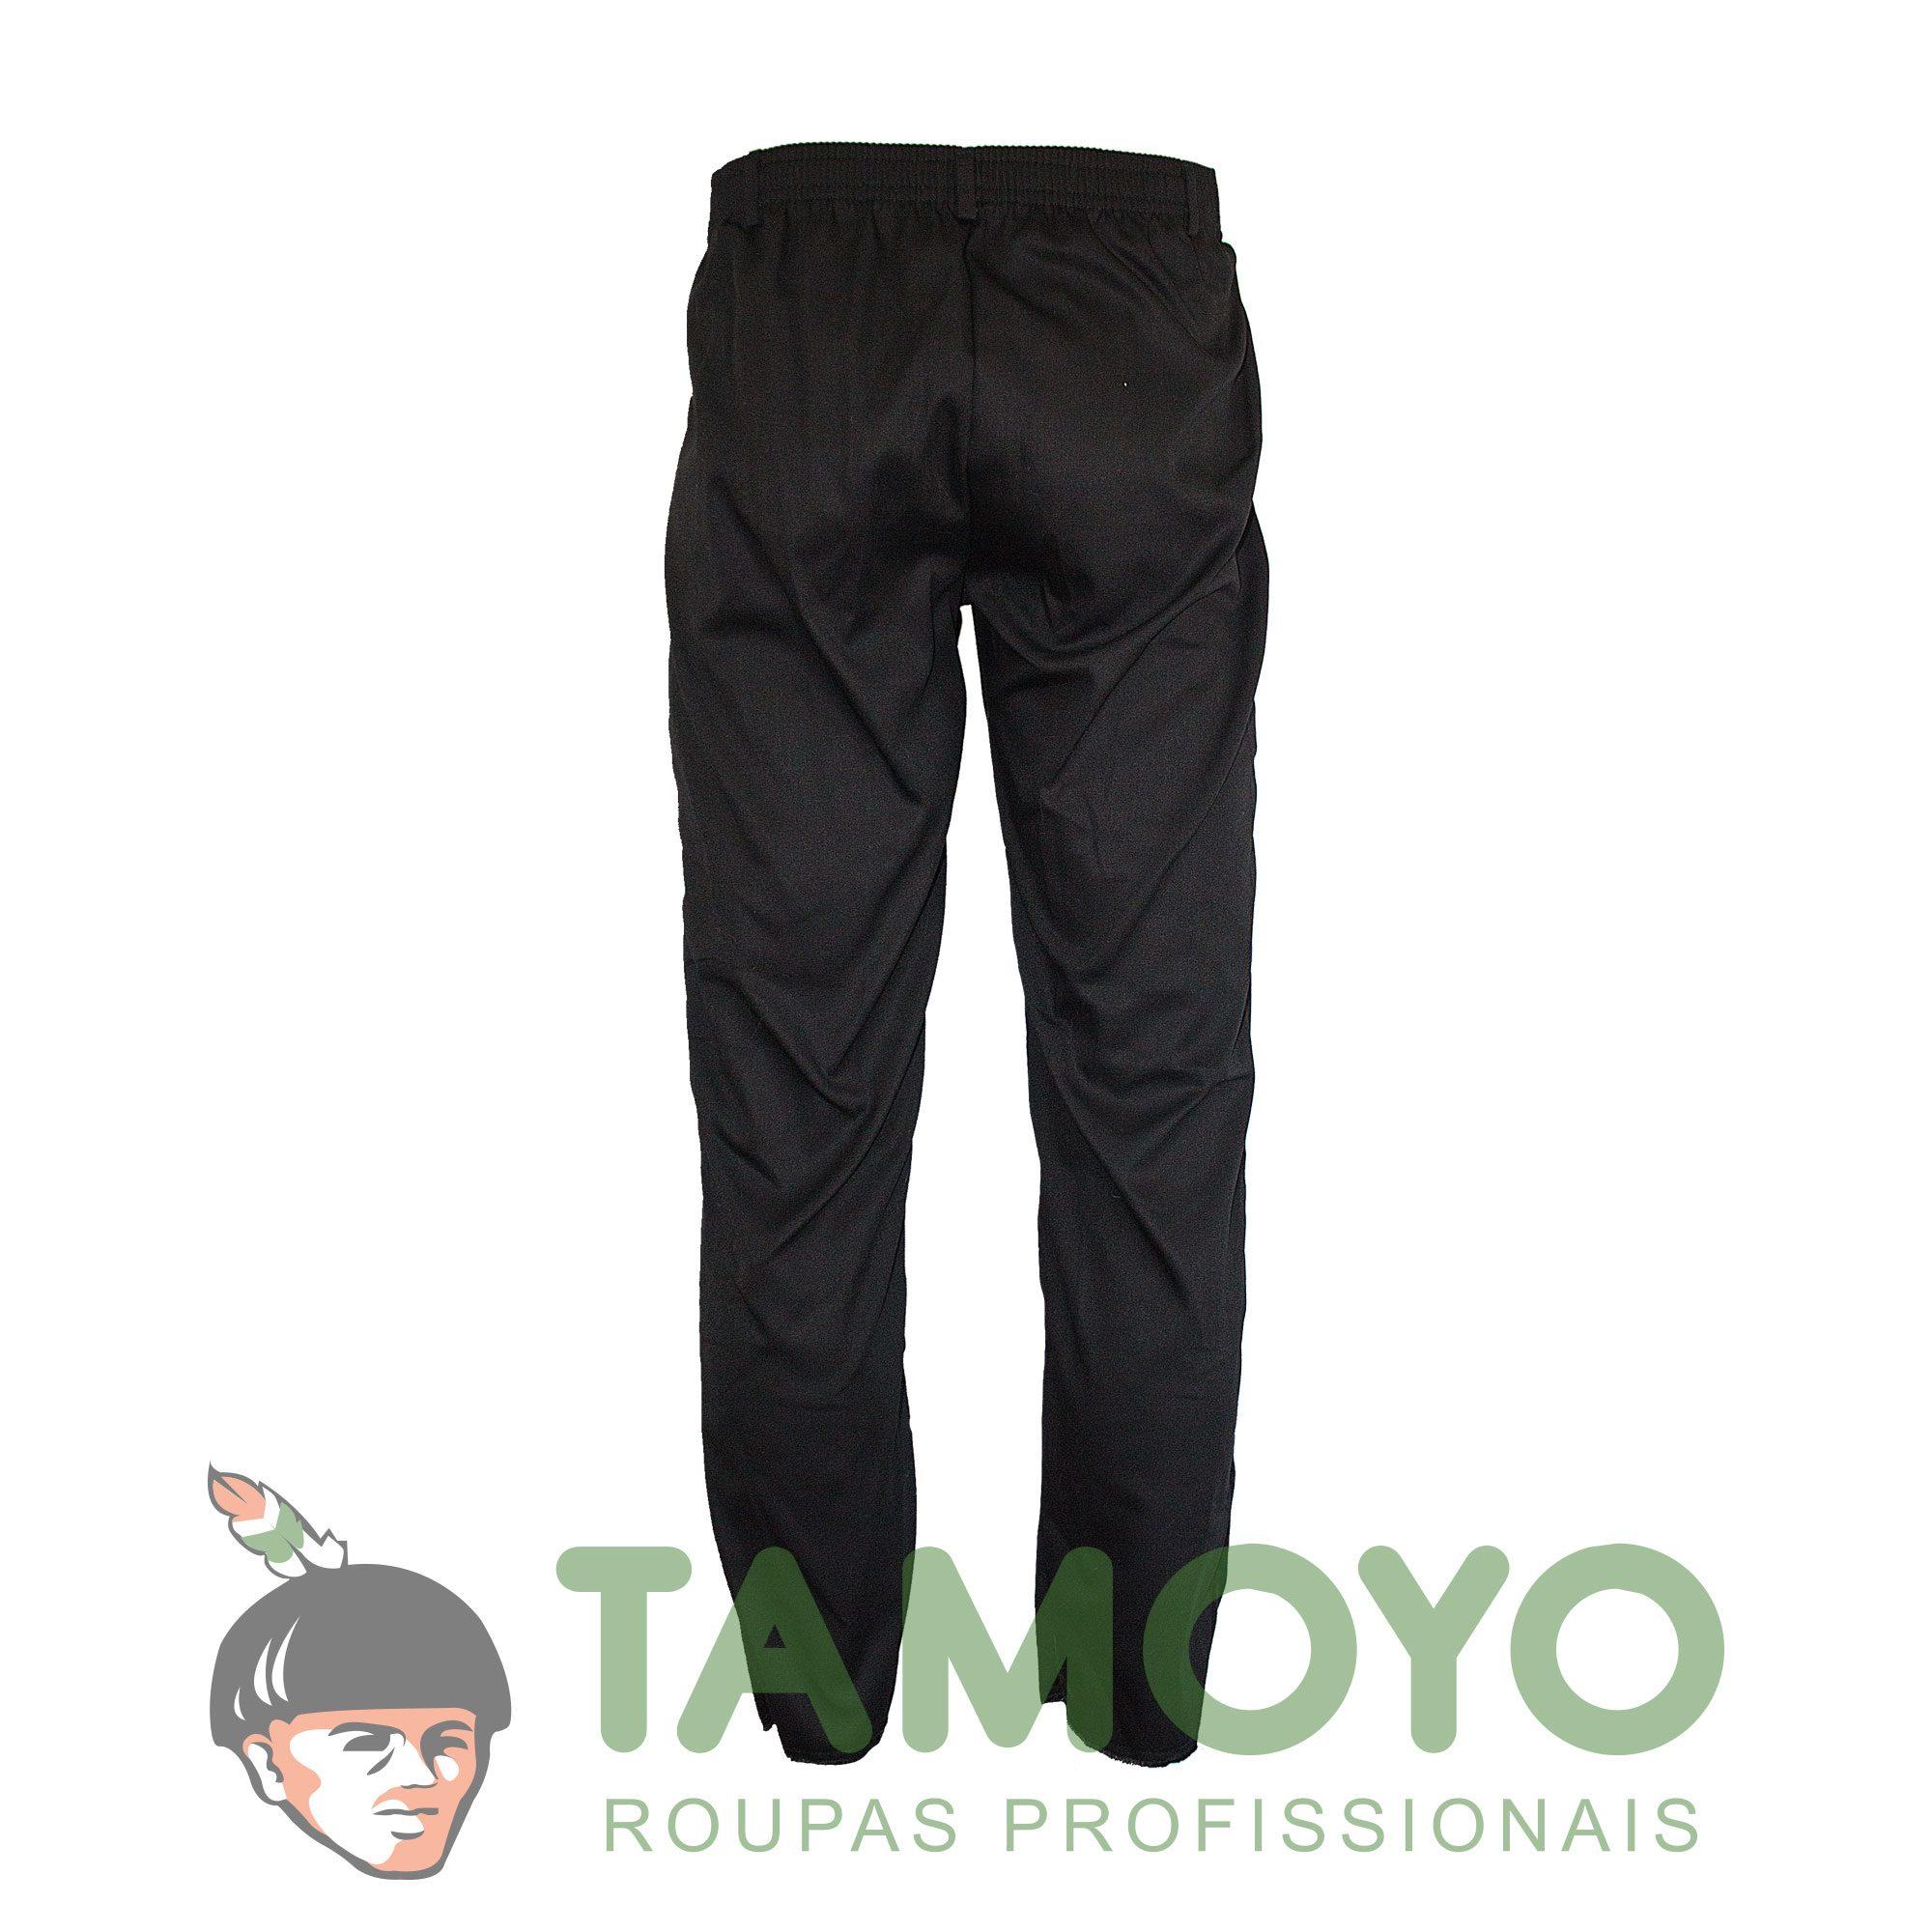 calca-atendente-masculina-roupas-tamoyo-uniformes-profissionais-c